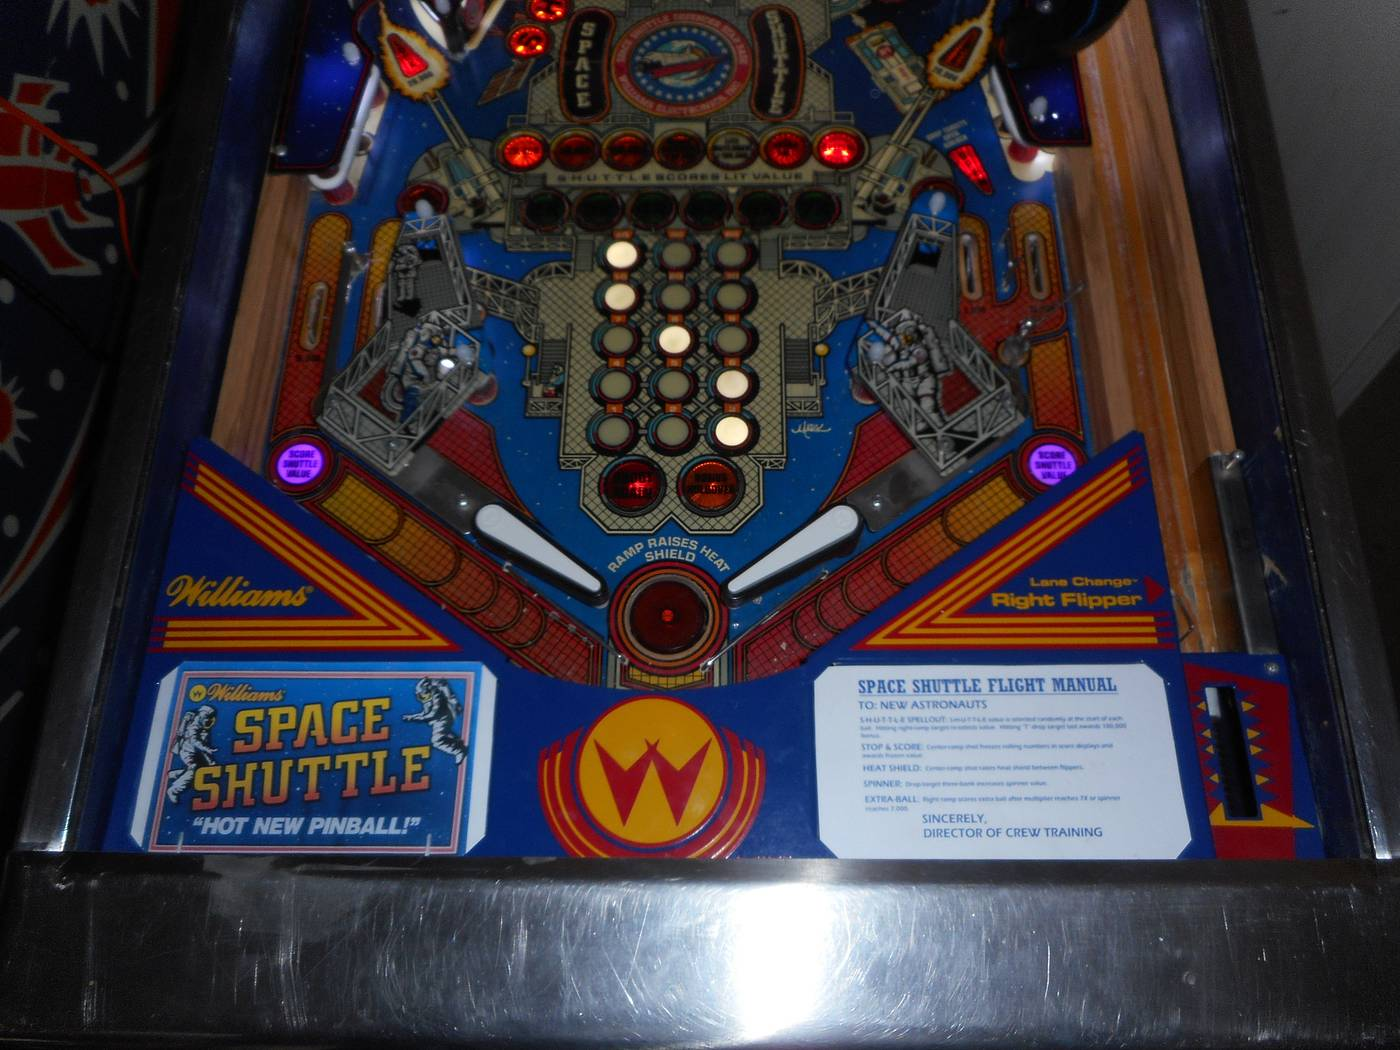 1984 Williams Space Shuttle pinball super kit